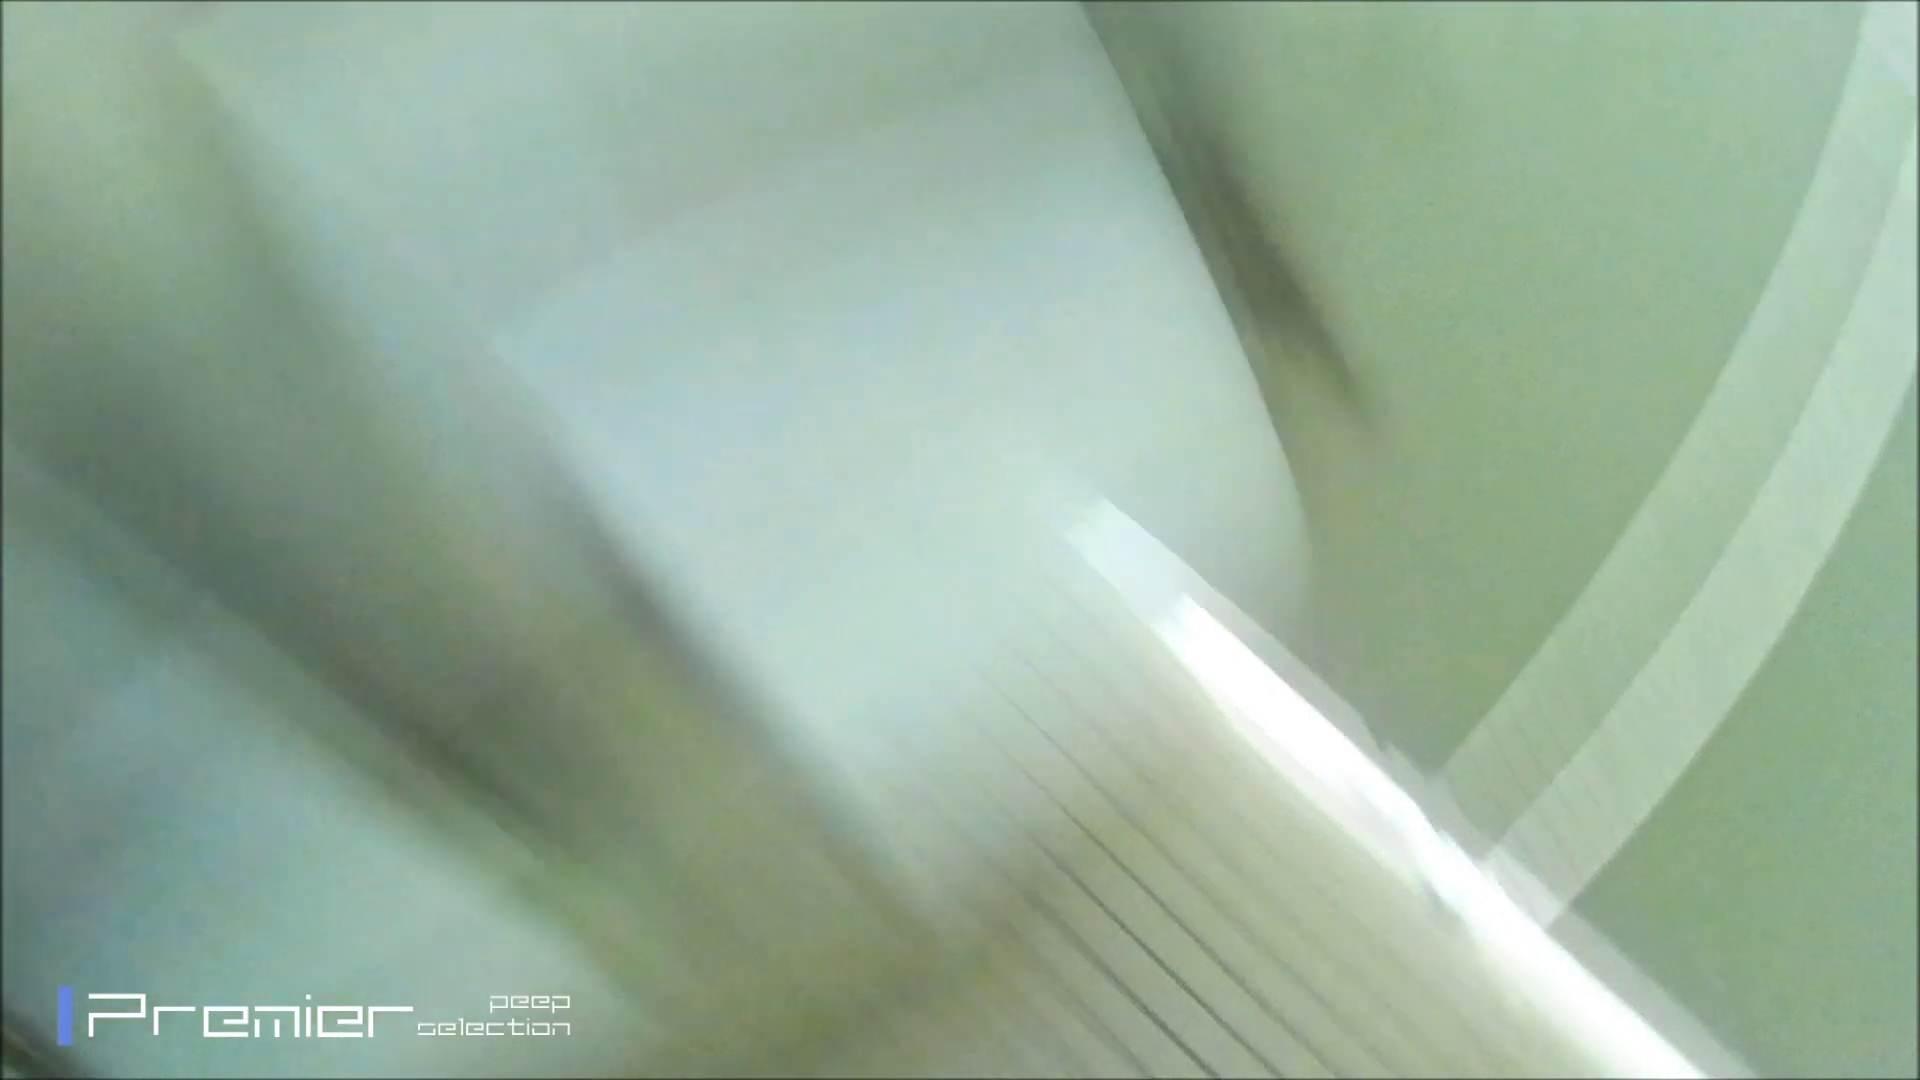 FHD激カワ!激やば! 復讐のトイレ盗撮 Vol.03 盛合せ 戯れ無修正画像 51画像 43